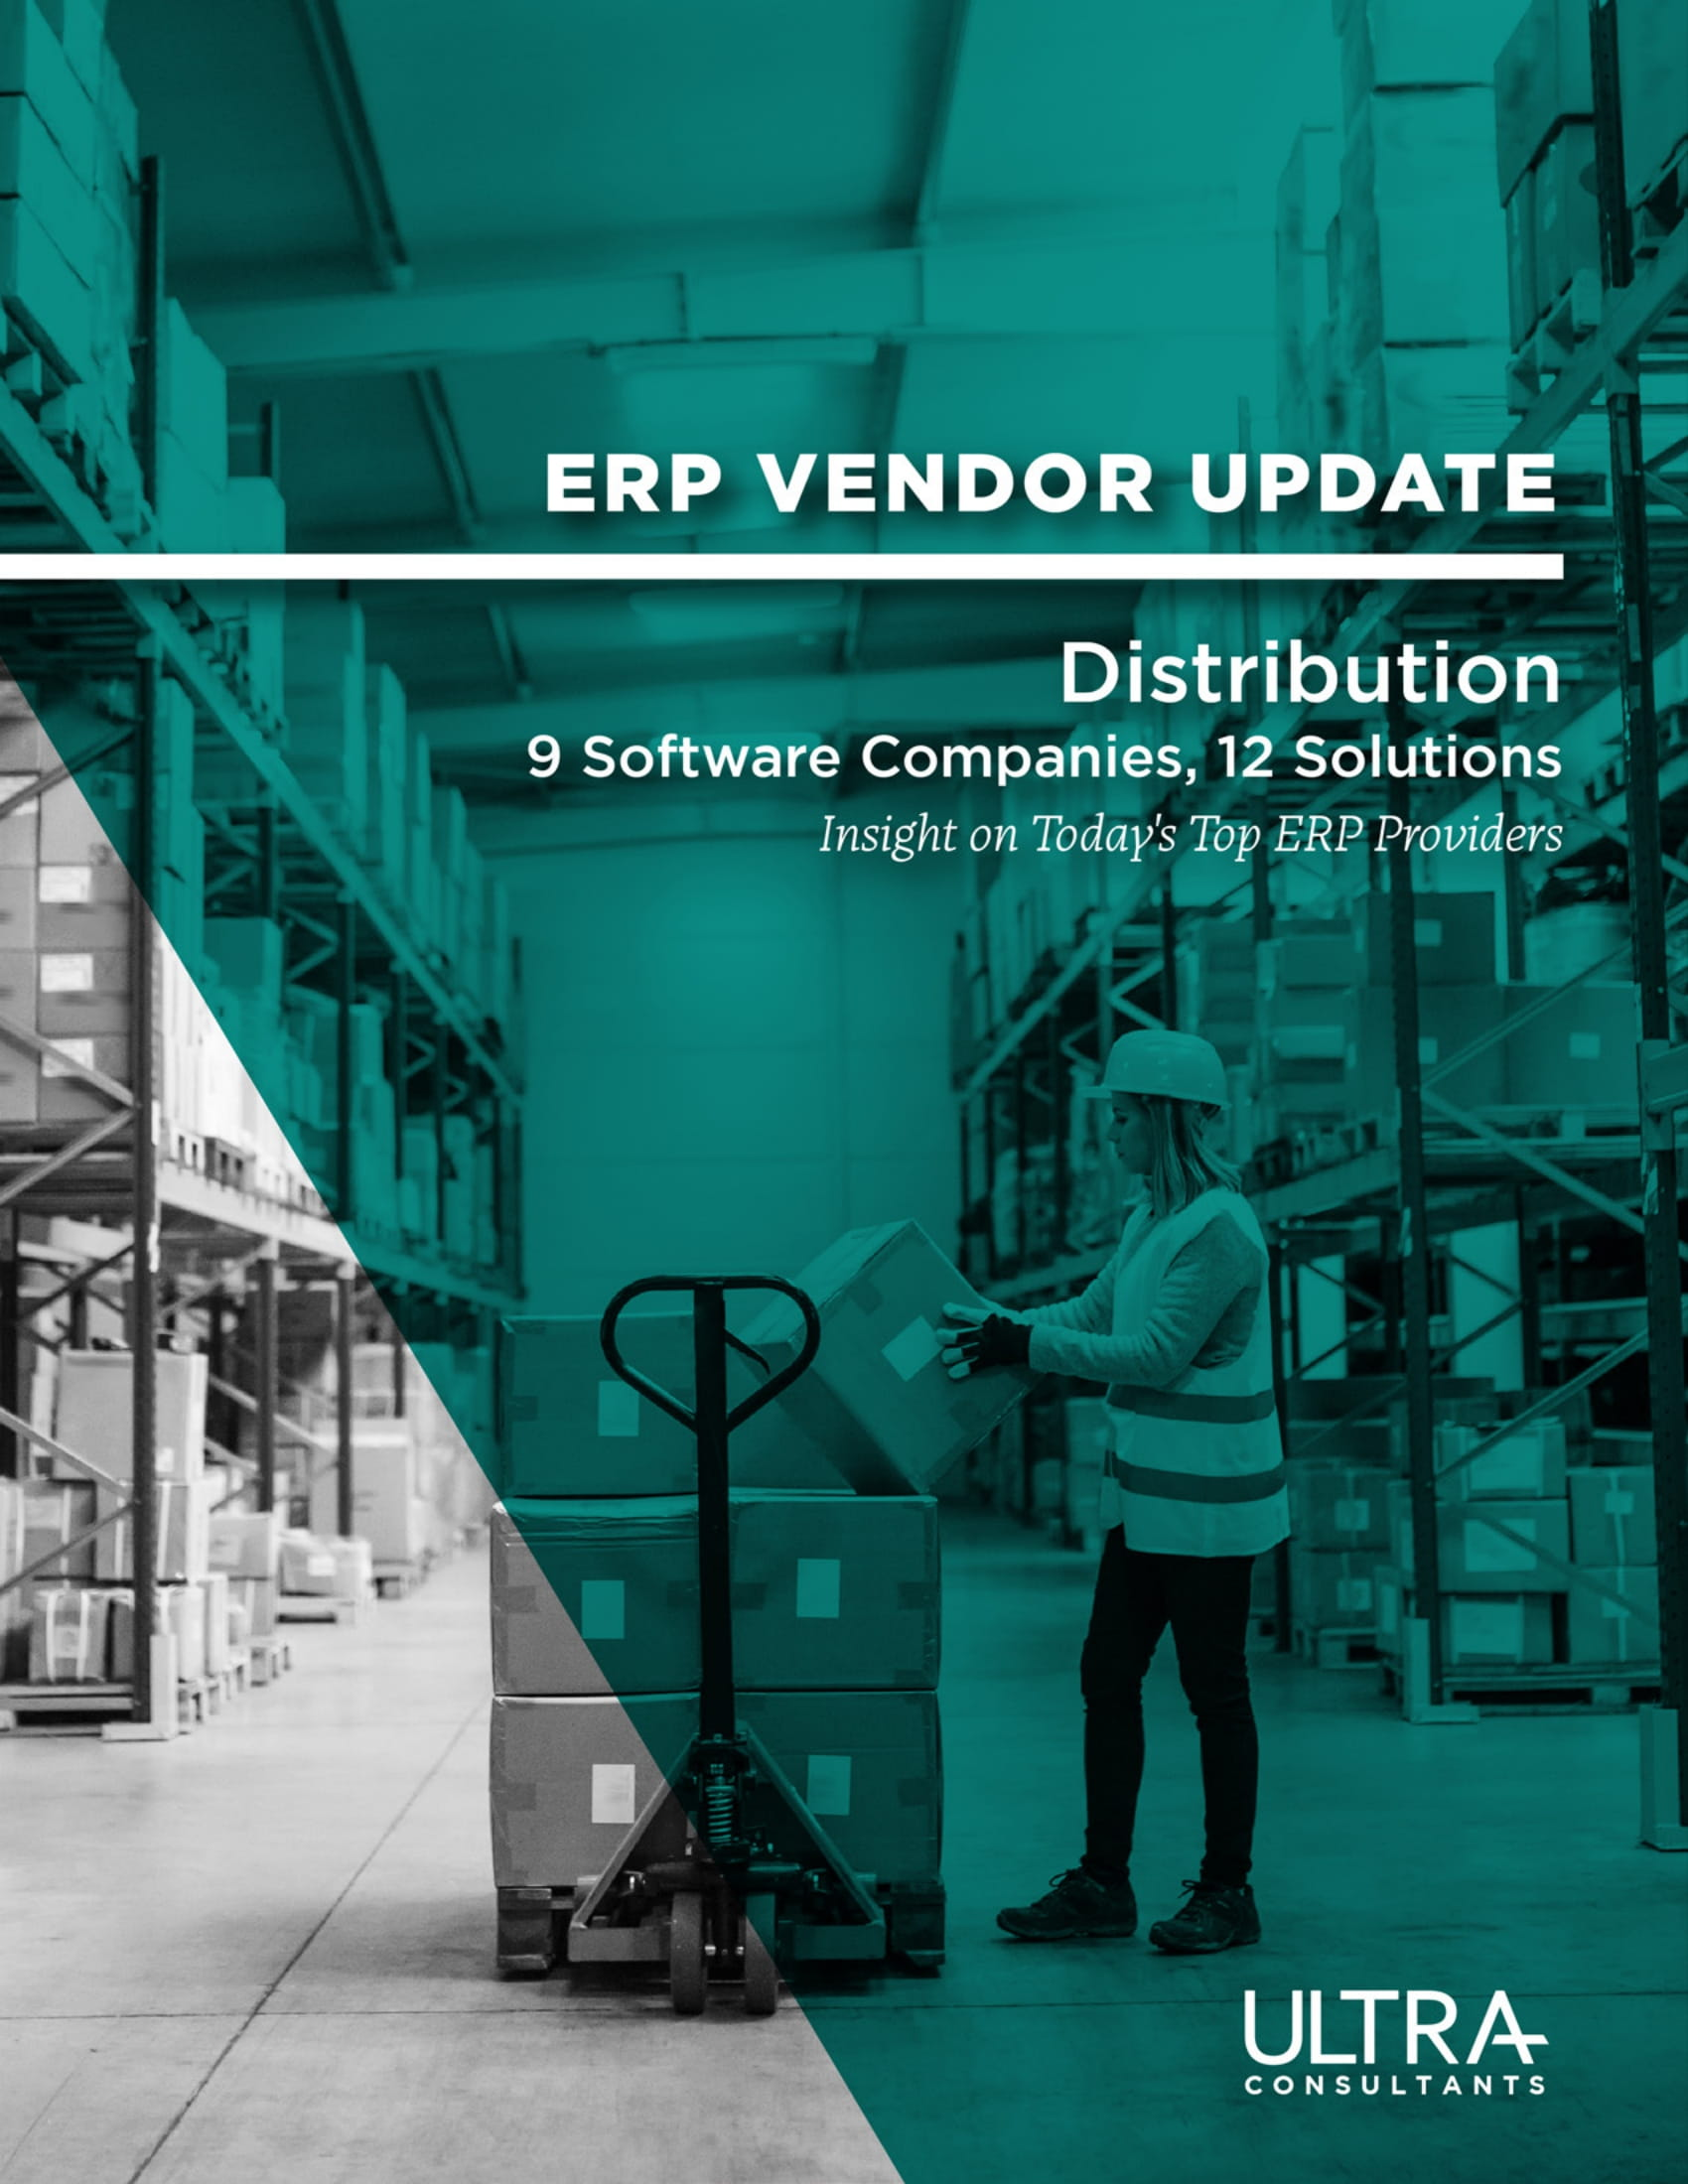 Acumatica Evaluated Against Top 10 ERP Vendor Selection Criteria for Distributors